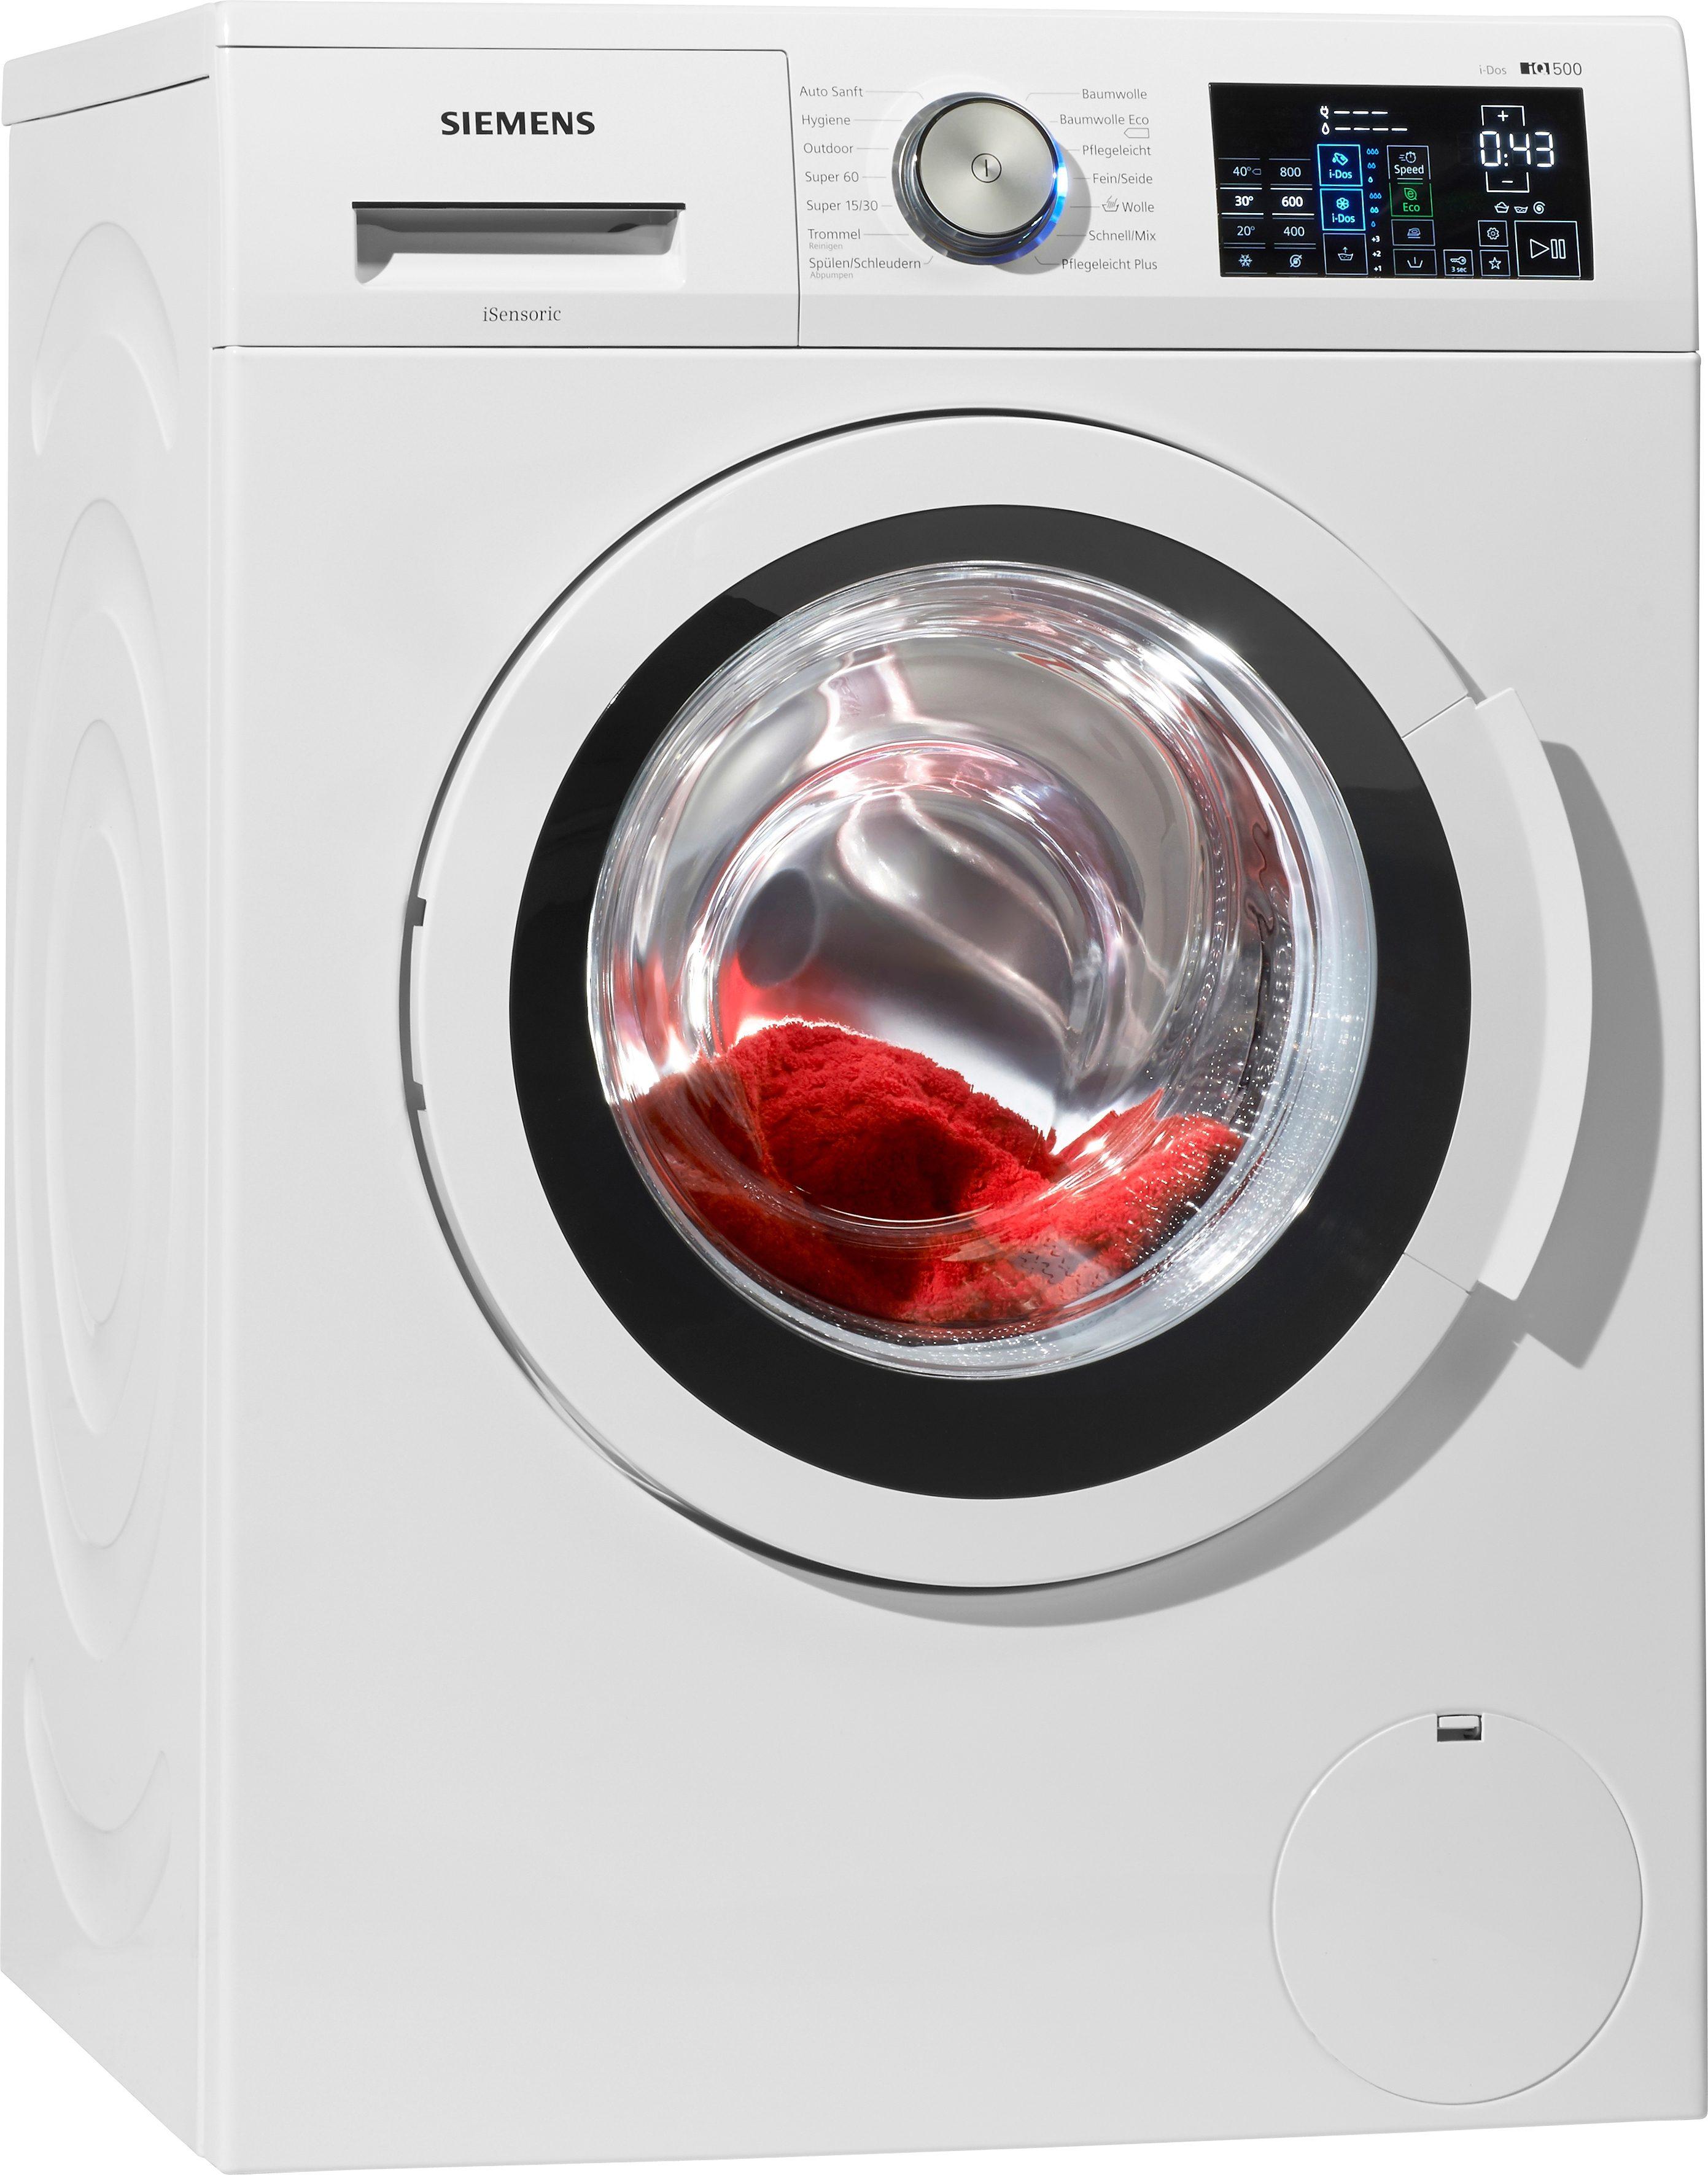 SIEMENS Waschmaschine iQ500 WM14T641 i-Dos, A+++, 8 kg, 1400 U/Min